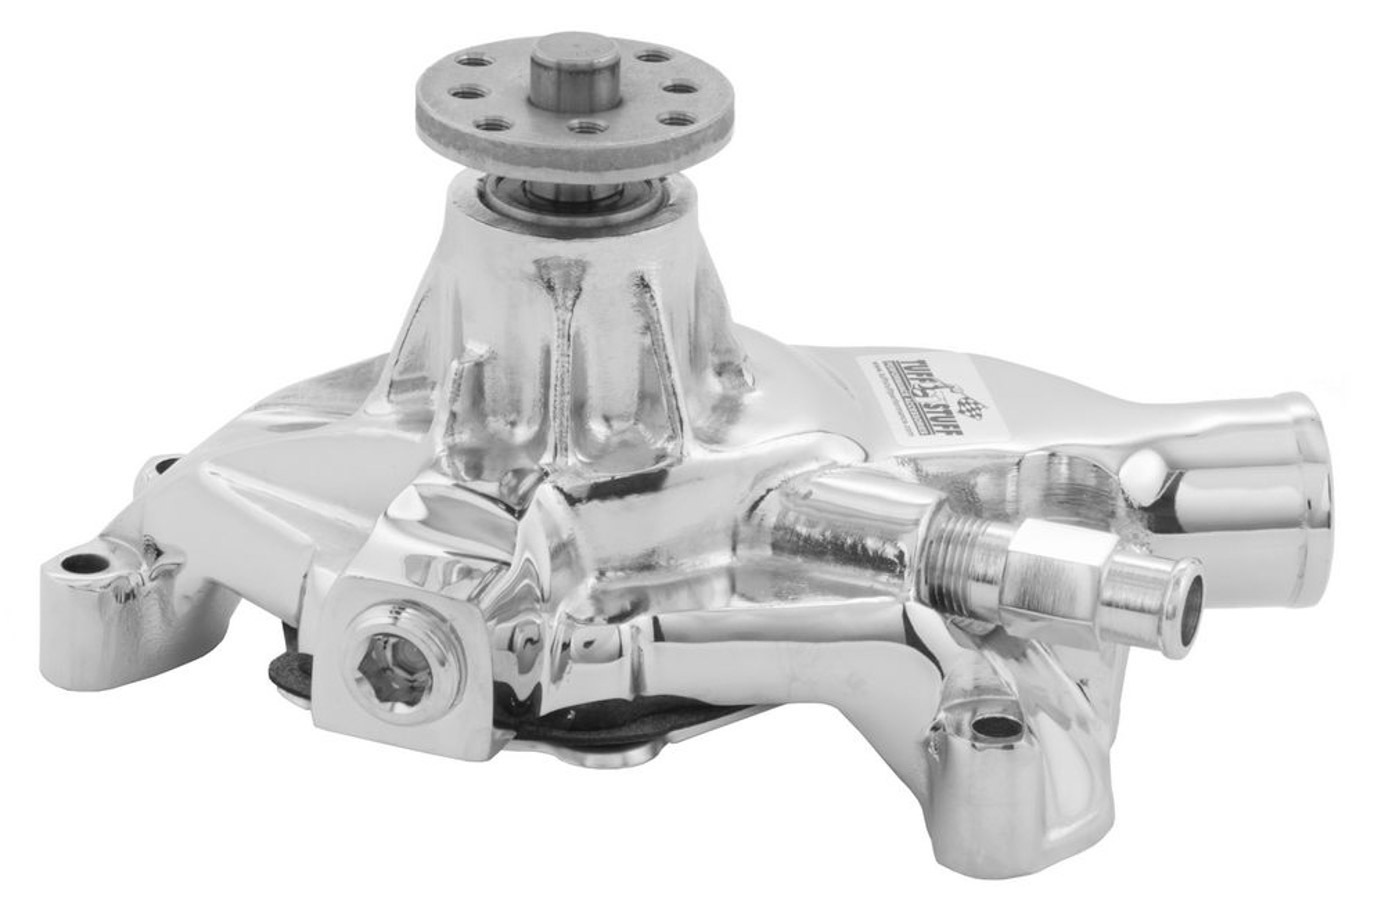 Tuff-Stuff 1534NA Water Pump, Mechanical, Iron, Chrome, Small Block Chevy, Each